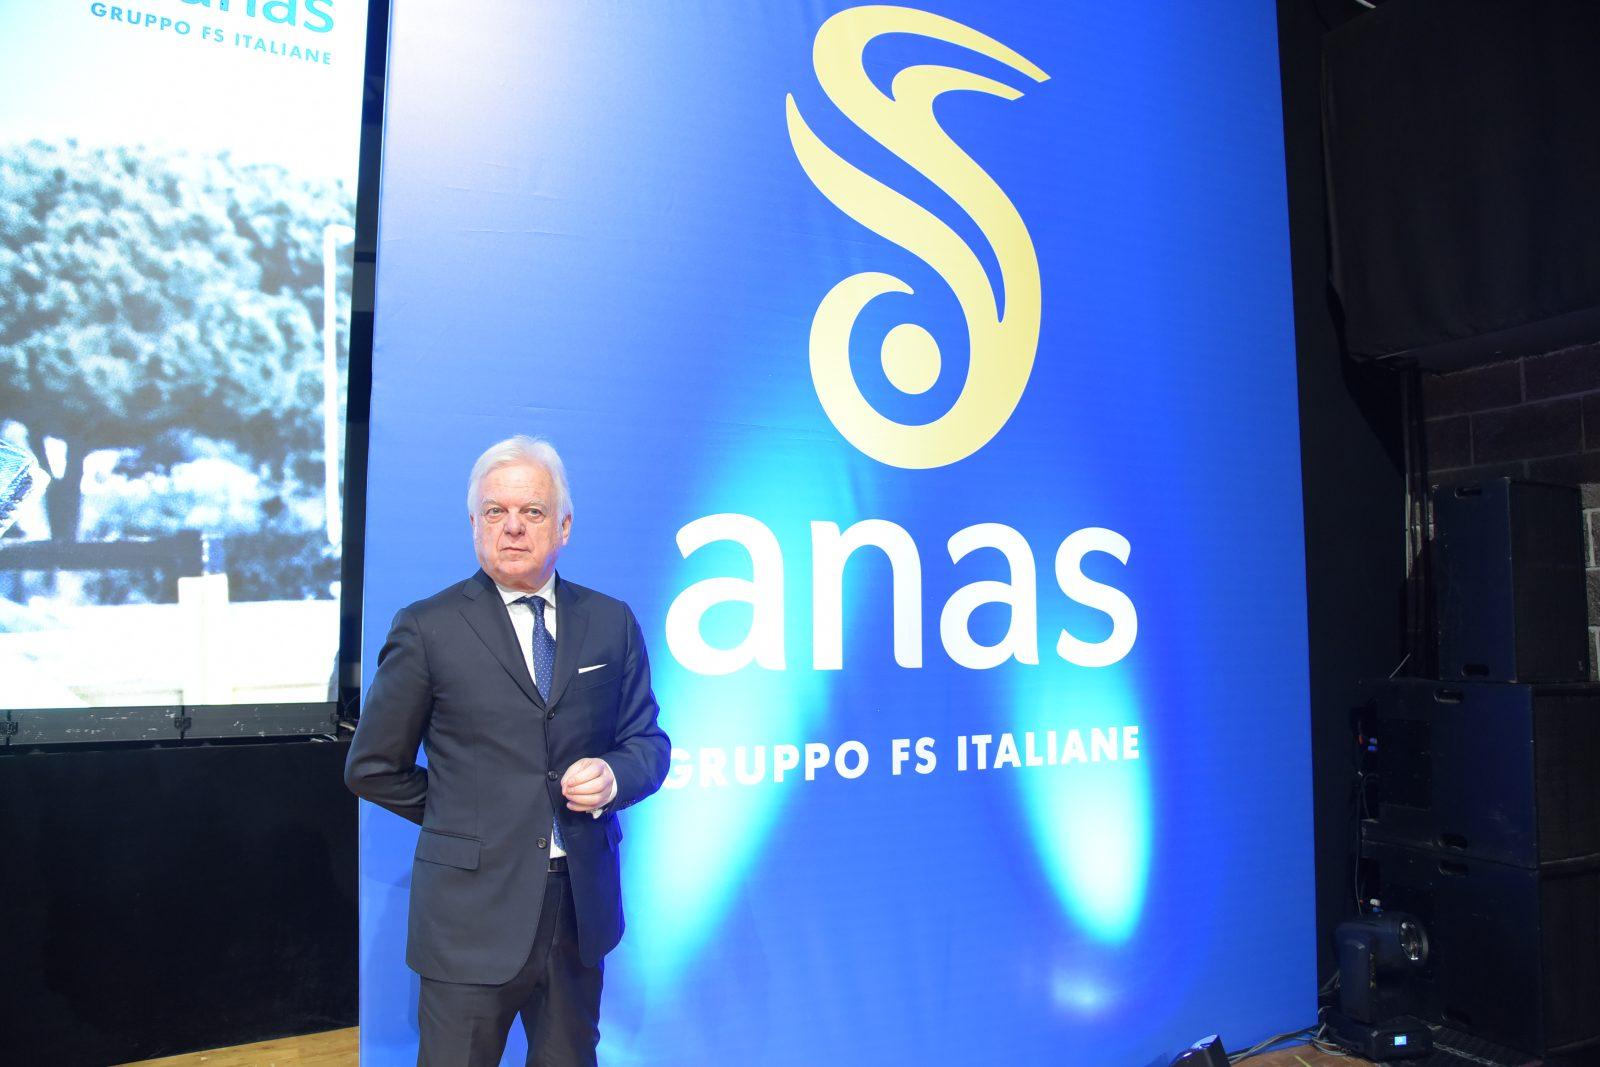 Il presidente Anas Claudio Andrea Gemme durante la Giornata del cantoniere (Archivio Anas, gennaio 2019)